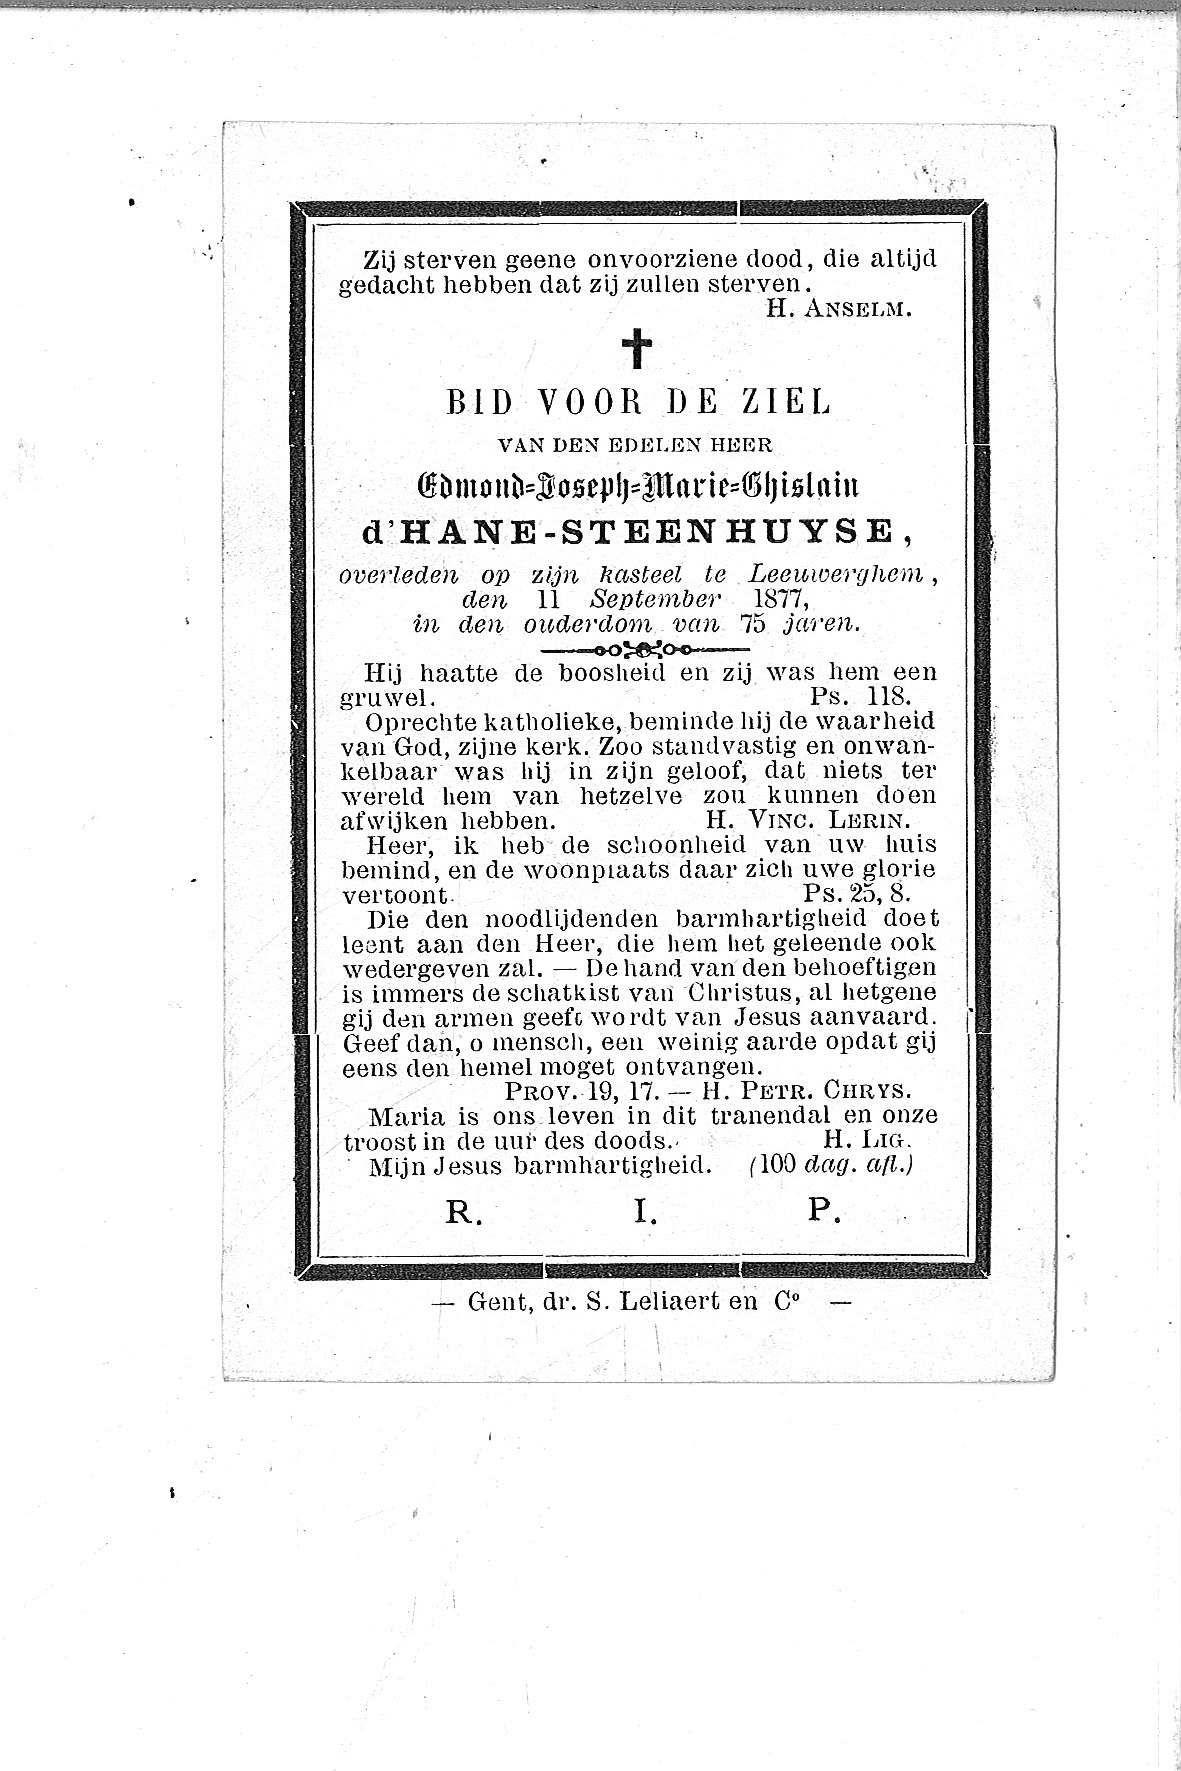 Edmond-Joseph-Marie-Ghislain-(1877)-20120919084524_00022.jpg